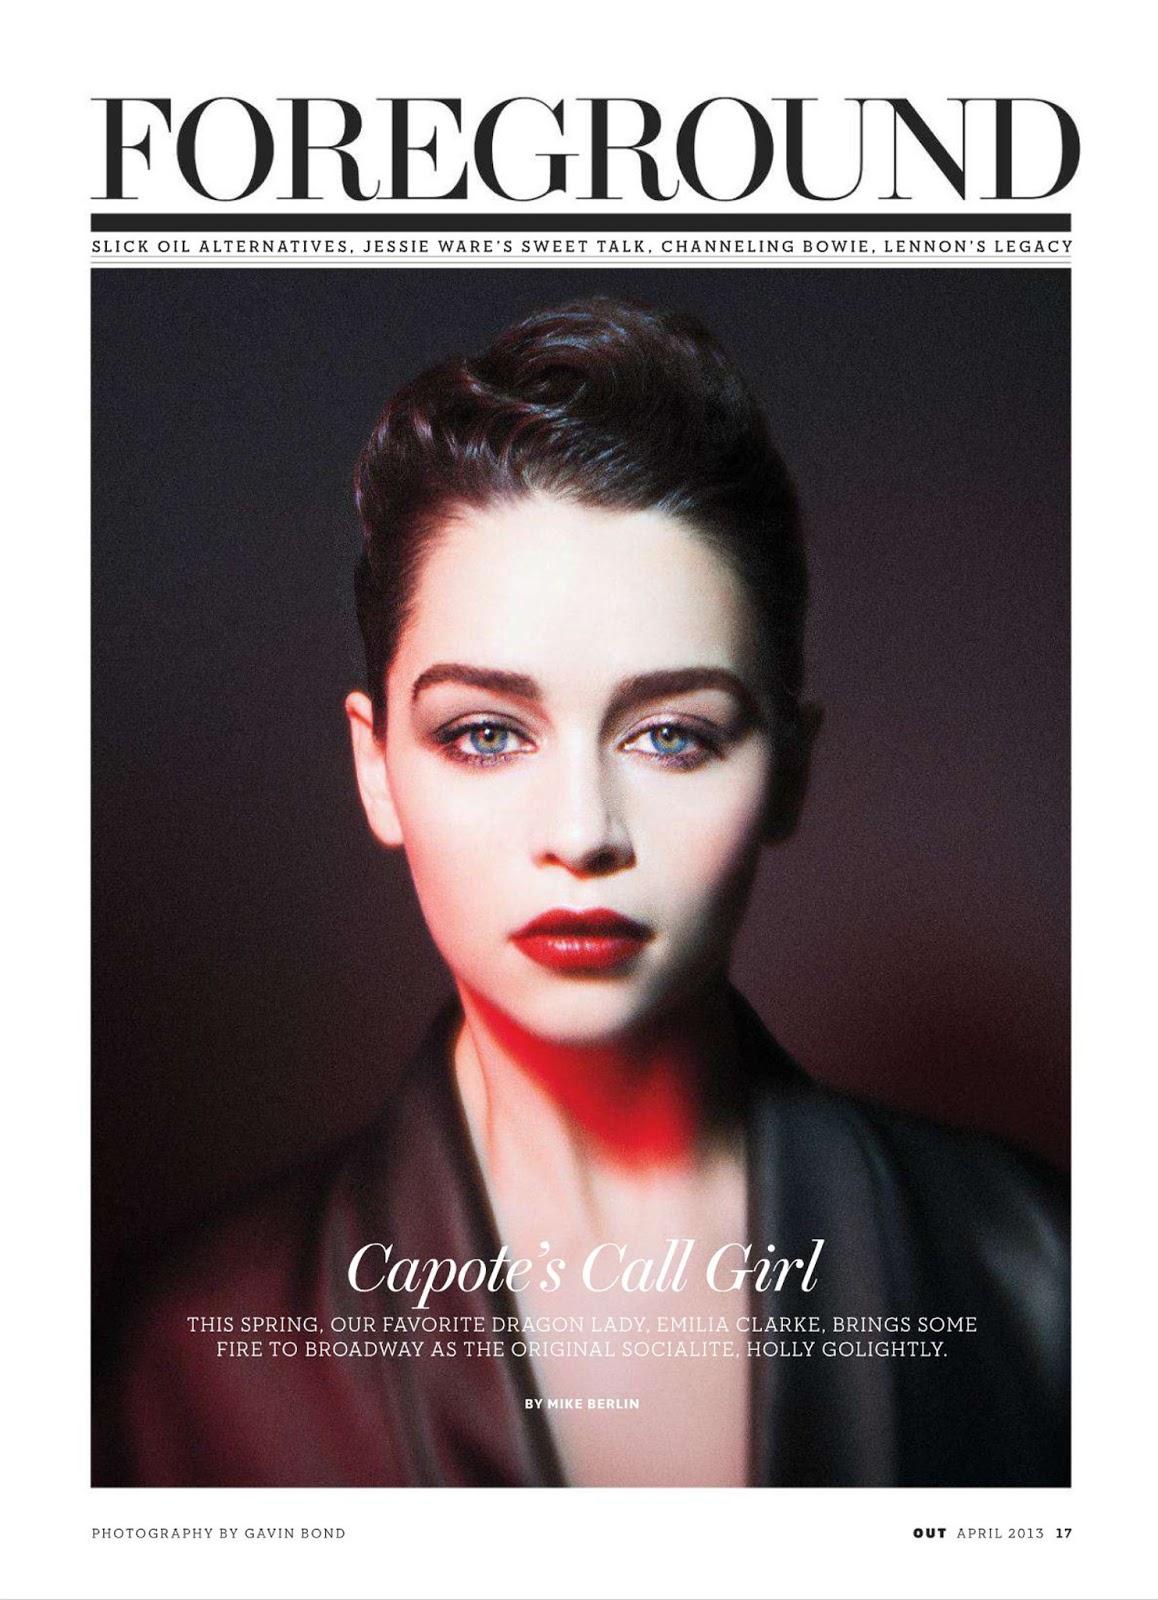 Gavin Bond Emilia Clarke Out Magazine 2013 04 t02